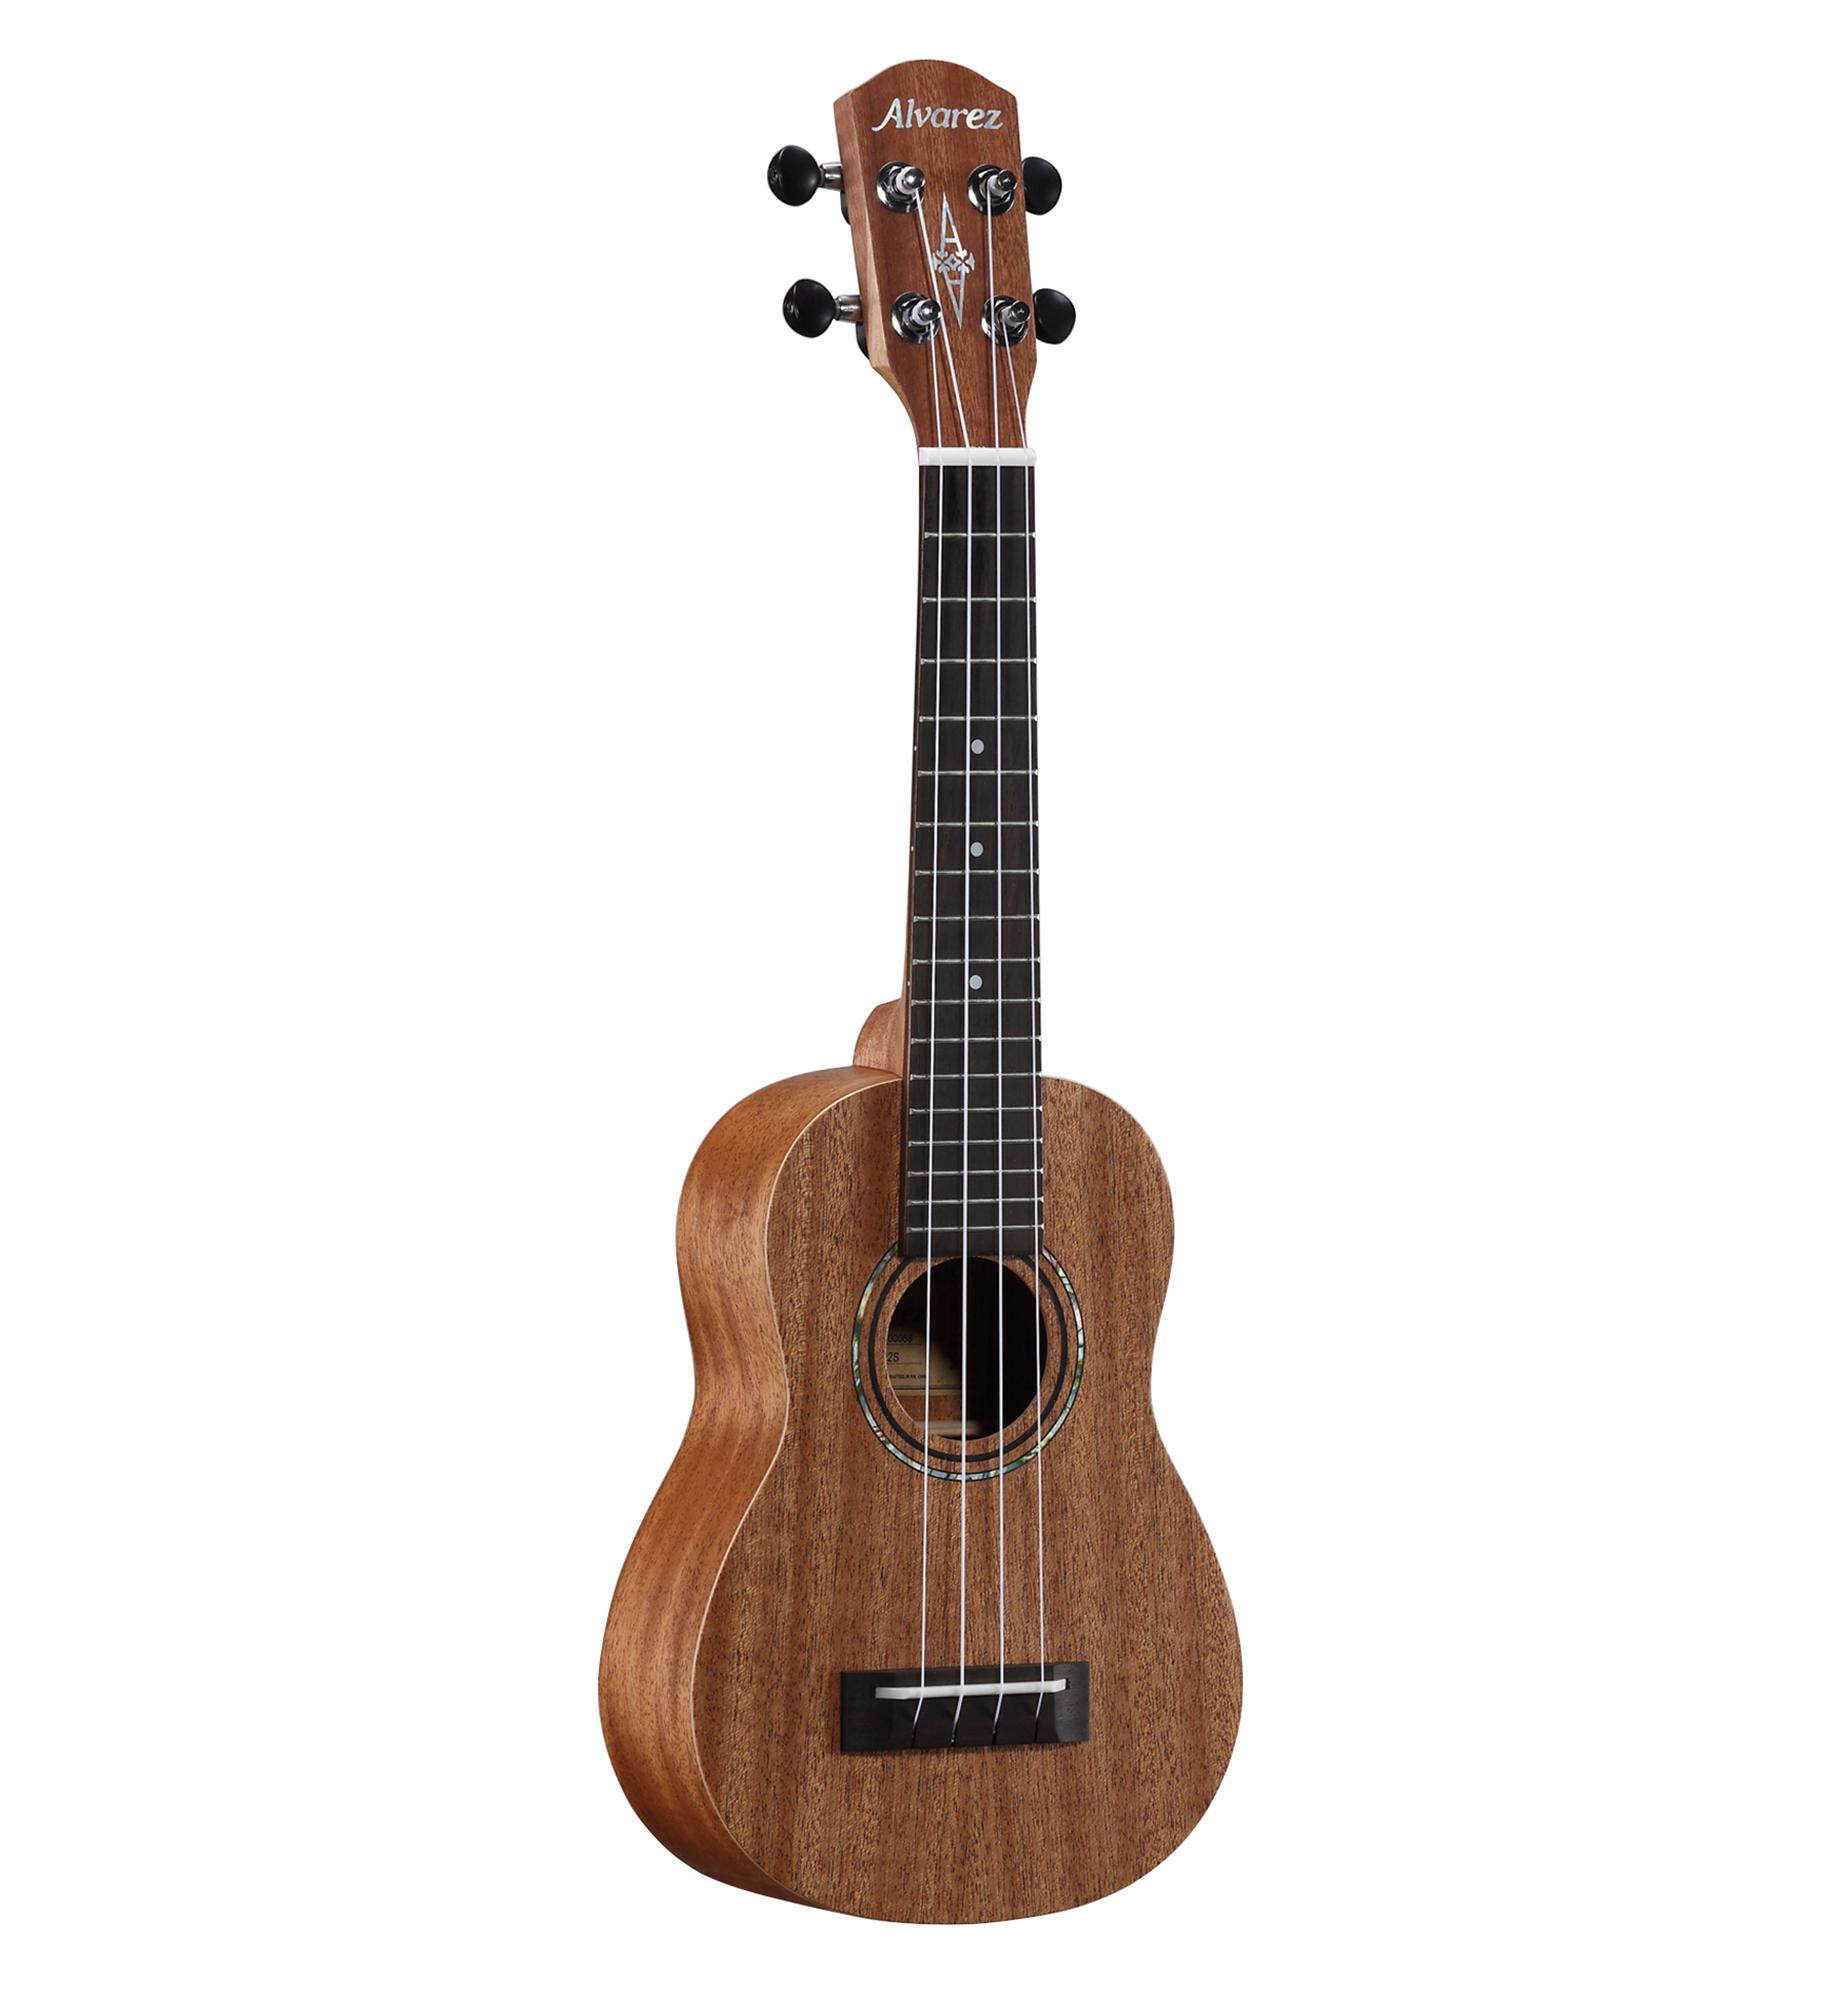 Alvarez RU22S Soprano ukulele